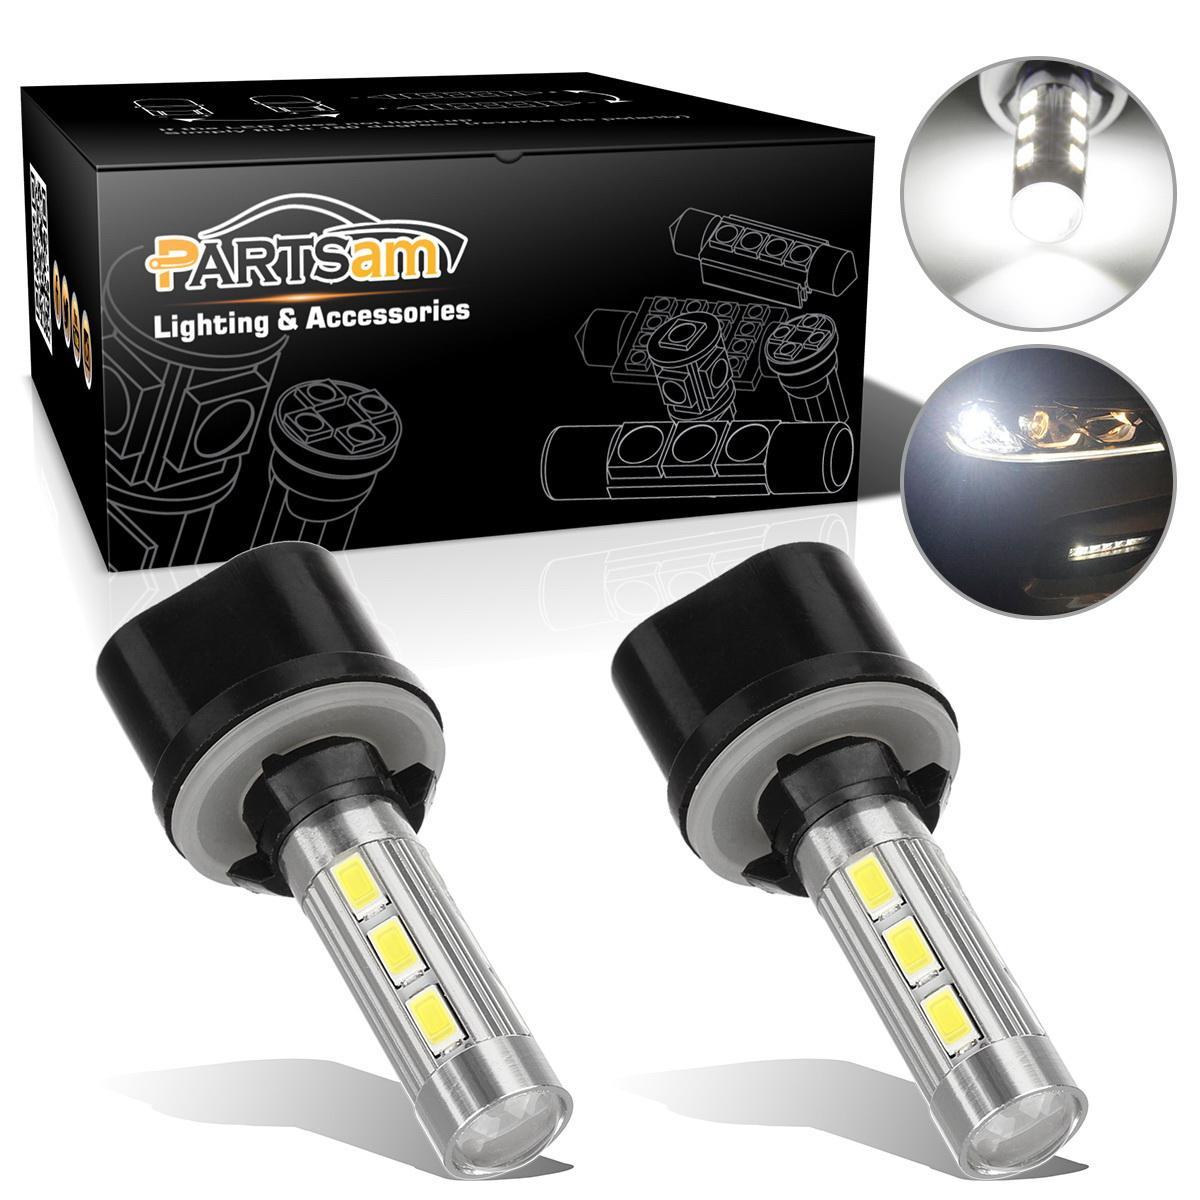 2005 2009 ford mustang 2x hid white 921 led reverse light bulb backup - Image Is Loading 2x White 880 892 893 899 High Power